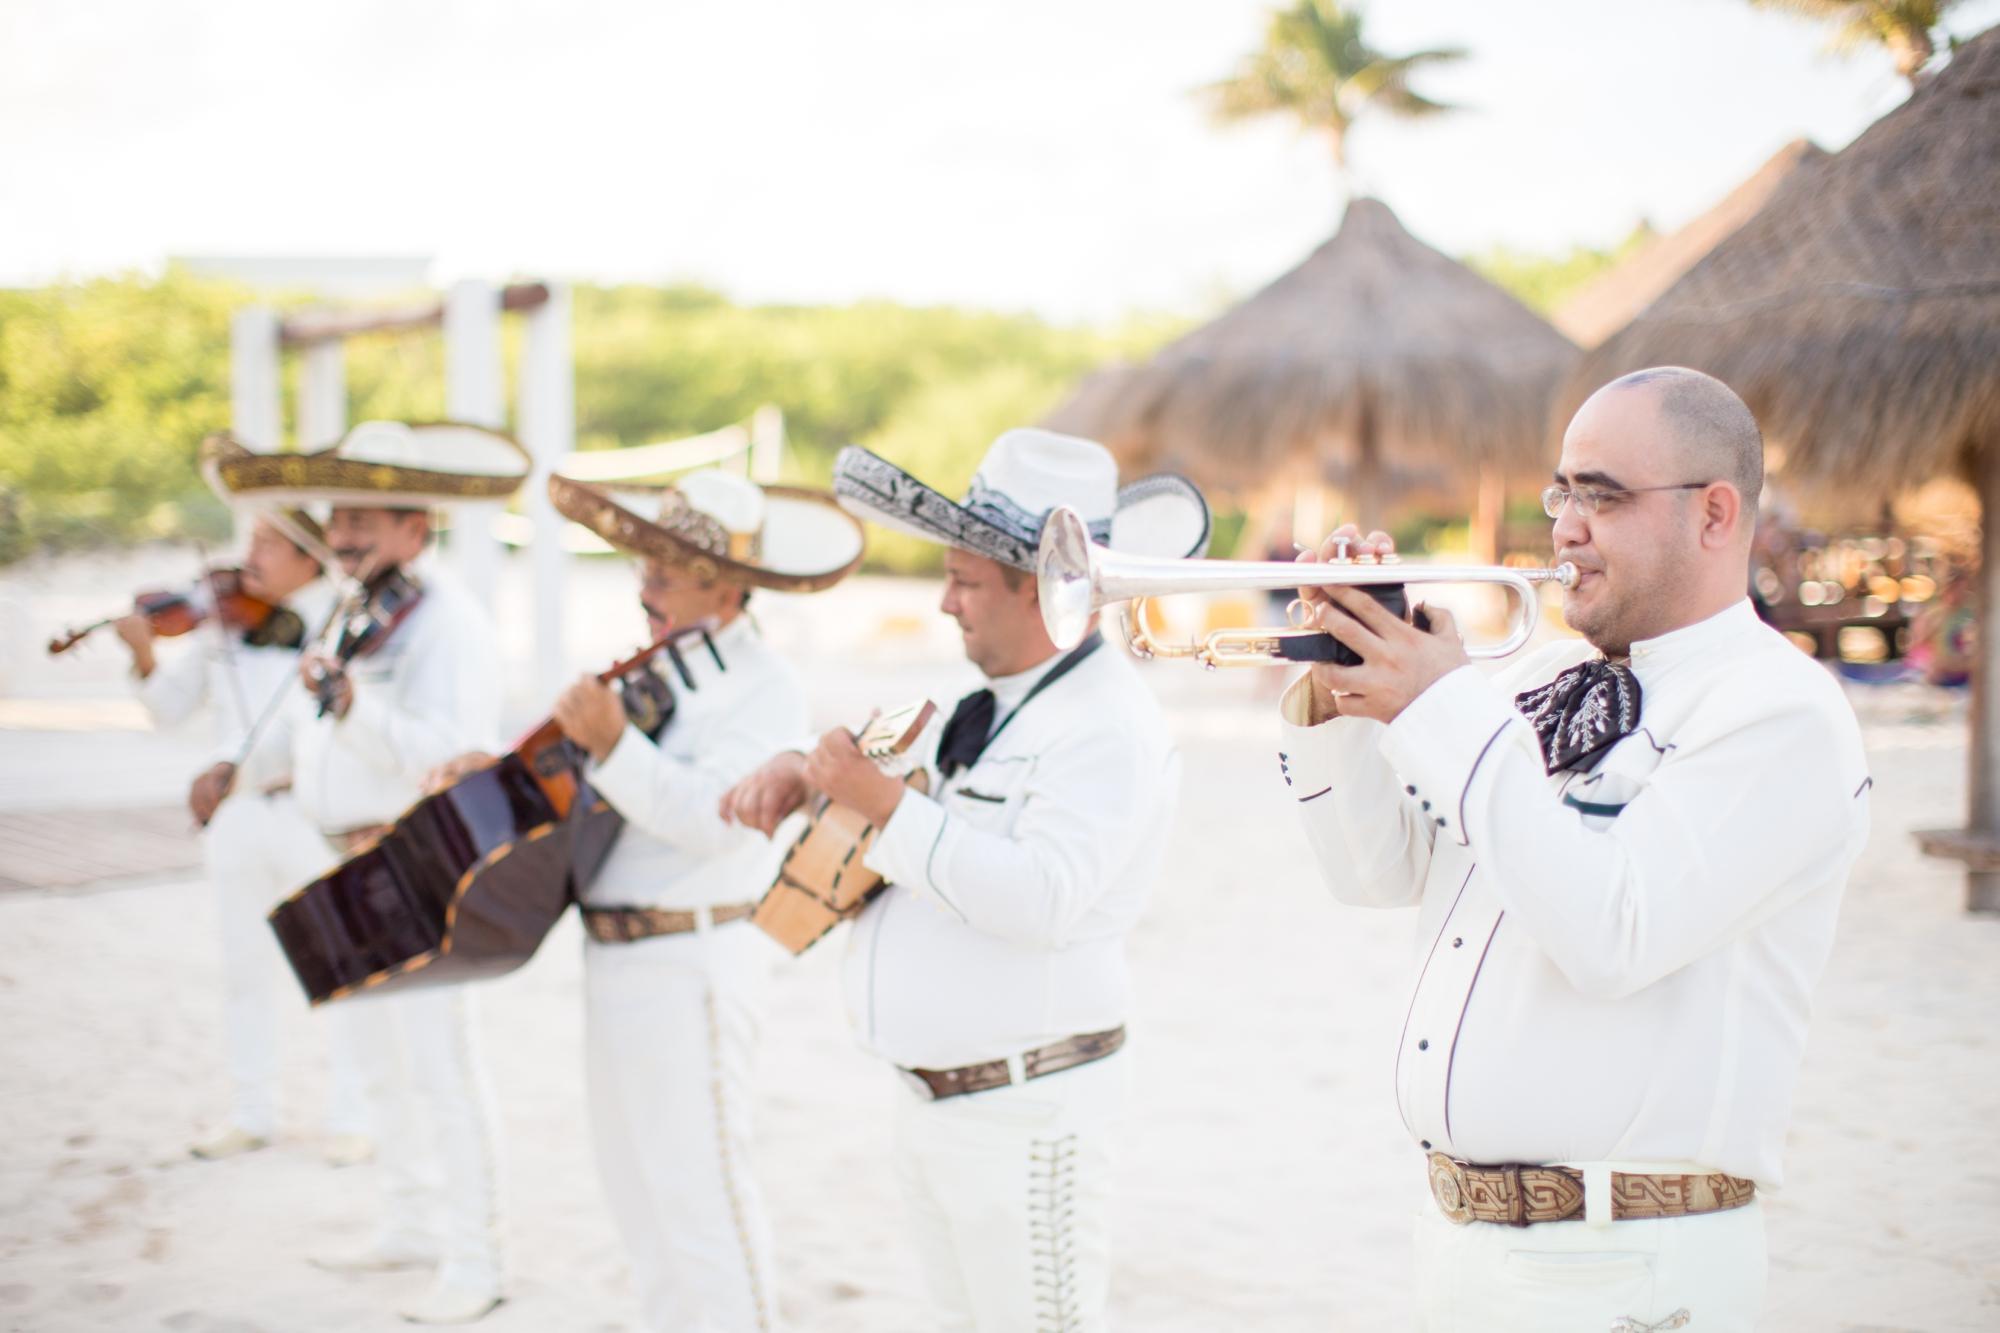 Morosoff Wedding 3-Family Formals-268_anna grace photography destination wedding photographer playa del carmen mexico photo.jpg